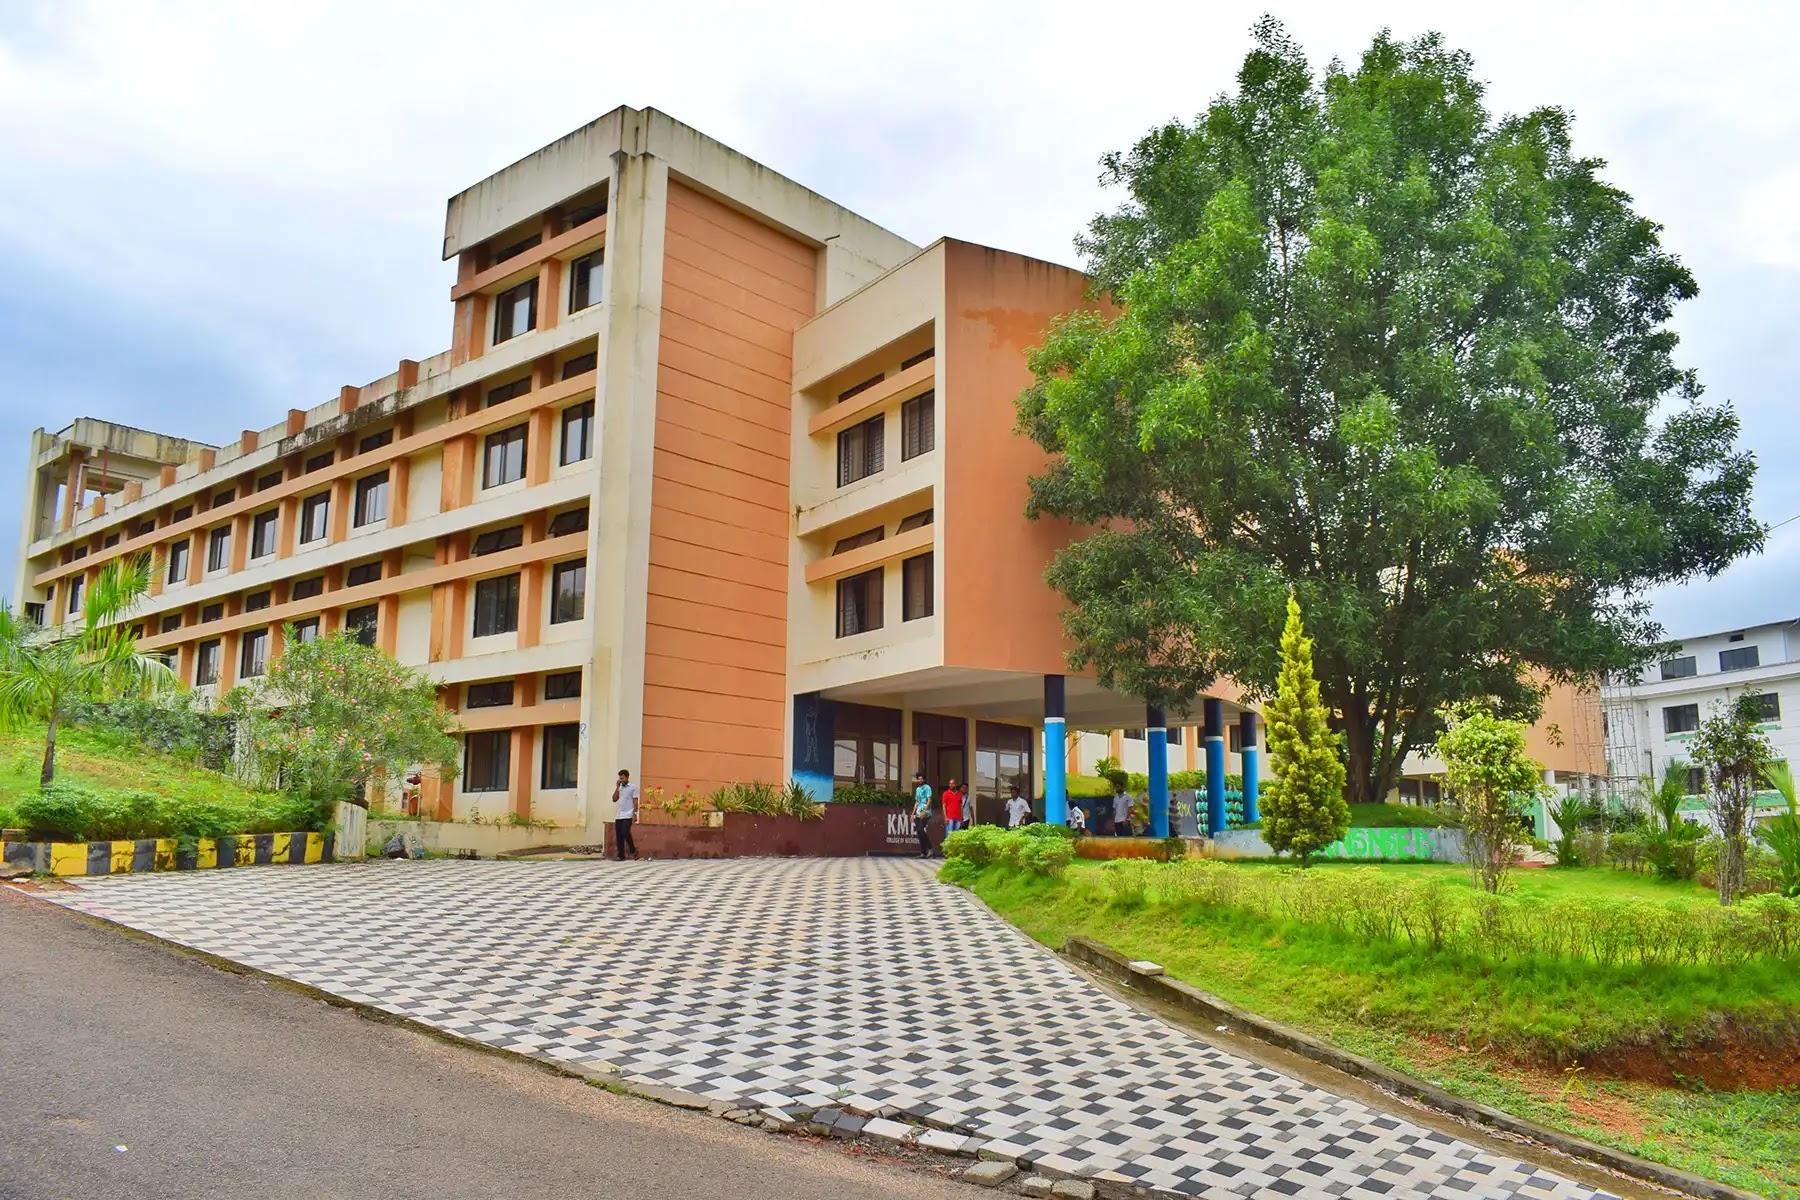 KMEA Engineering College, Kerala